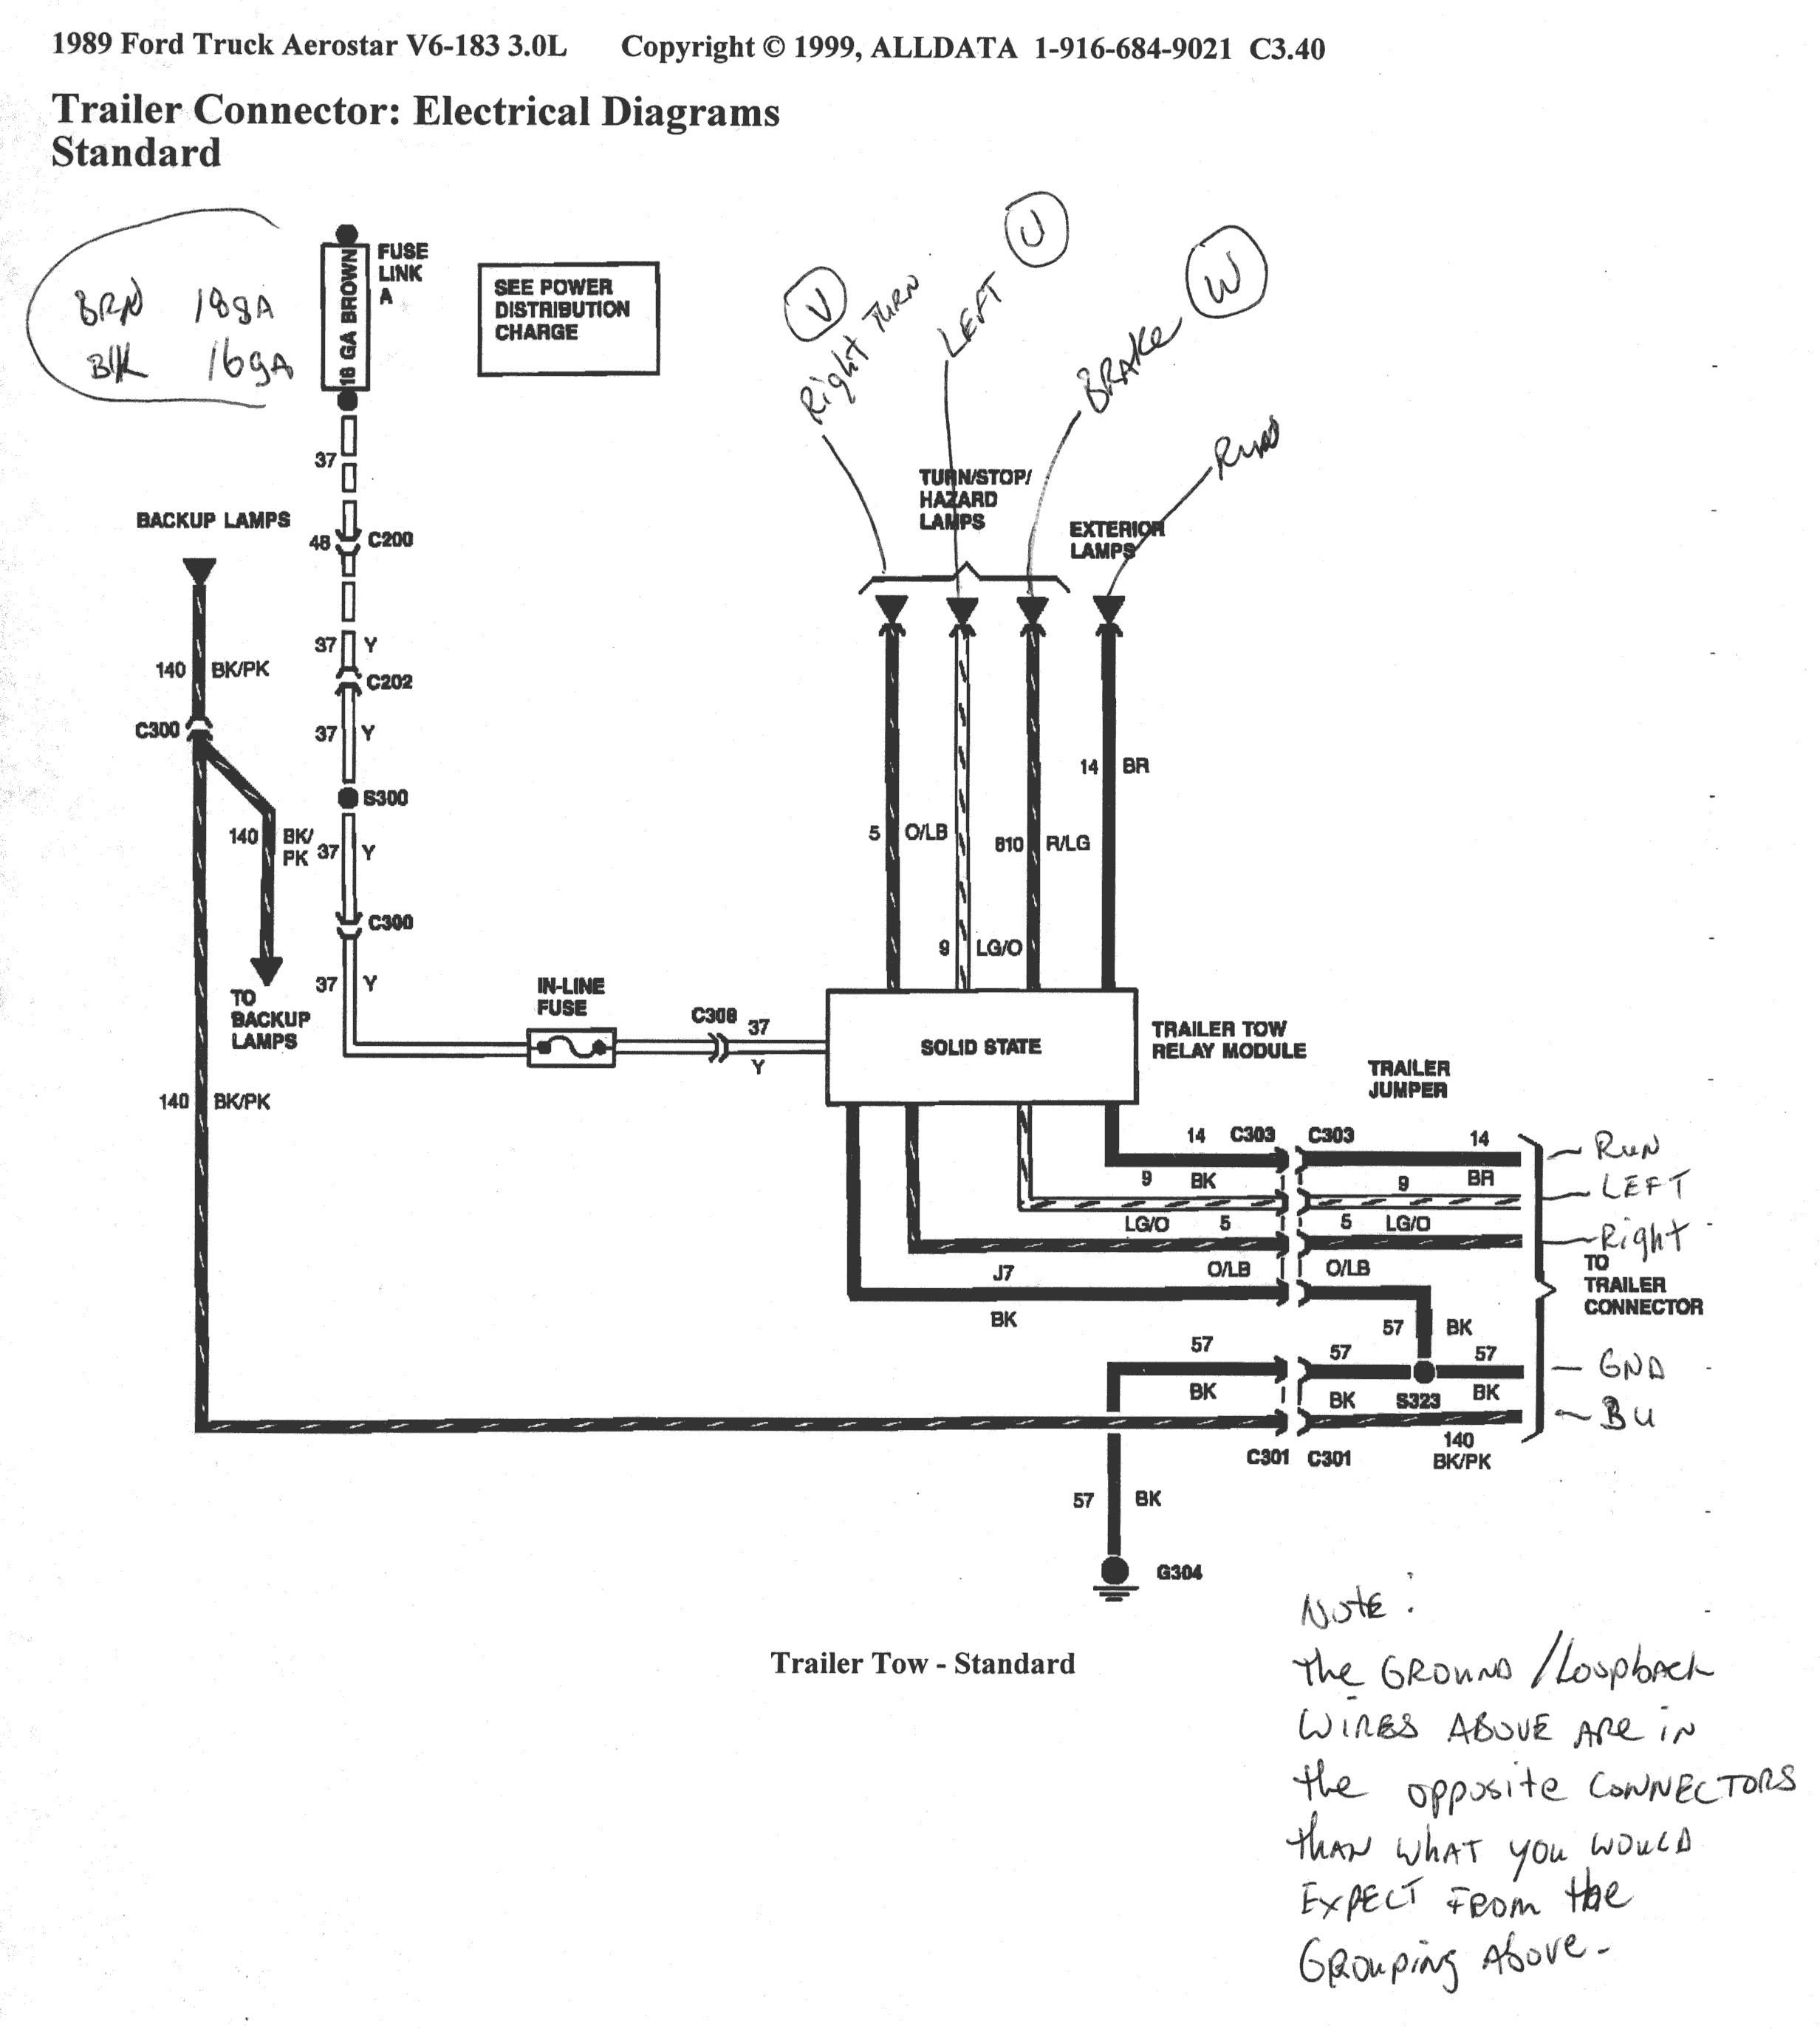 Car Trailer Wiring Diagram Trailer Light Plug Diagram Wiring Diagram Of Car Trailer Wiring Diagram